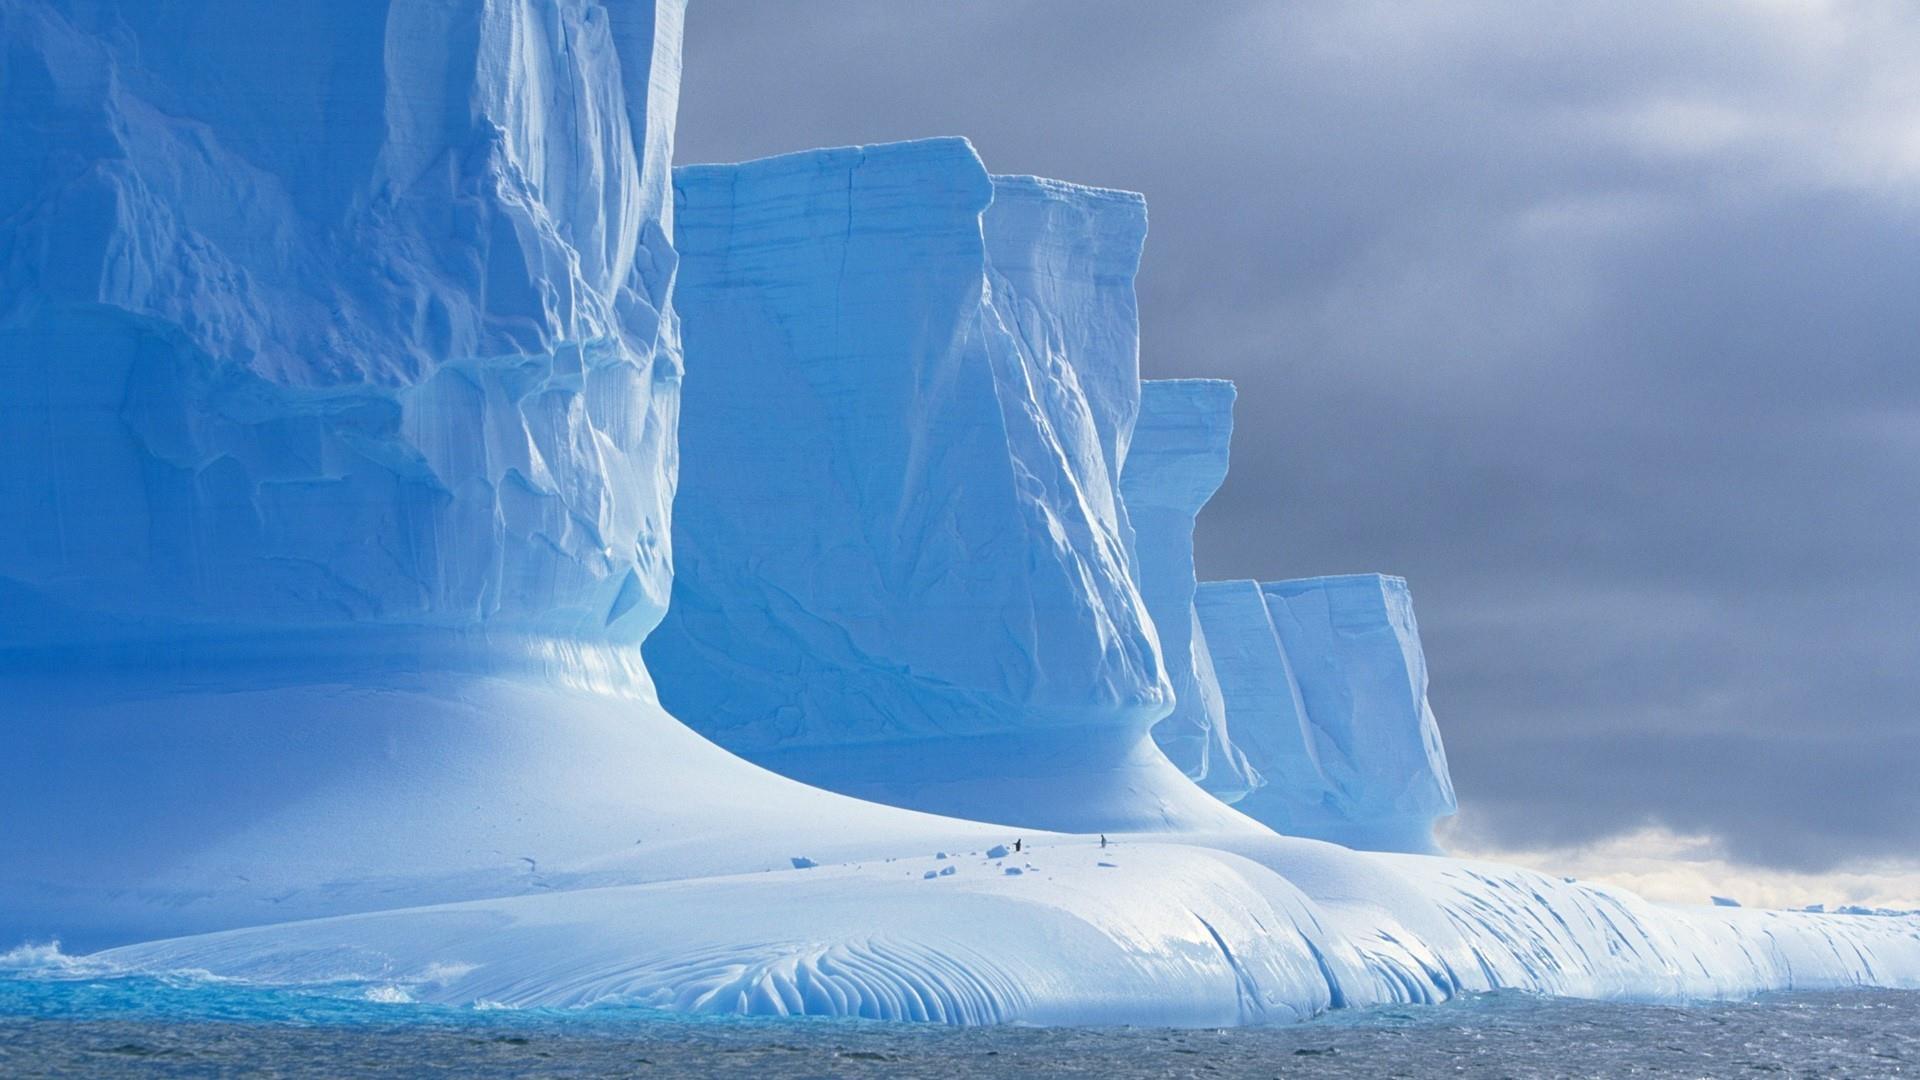 Icebergs on Antarctica wallpaper